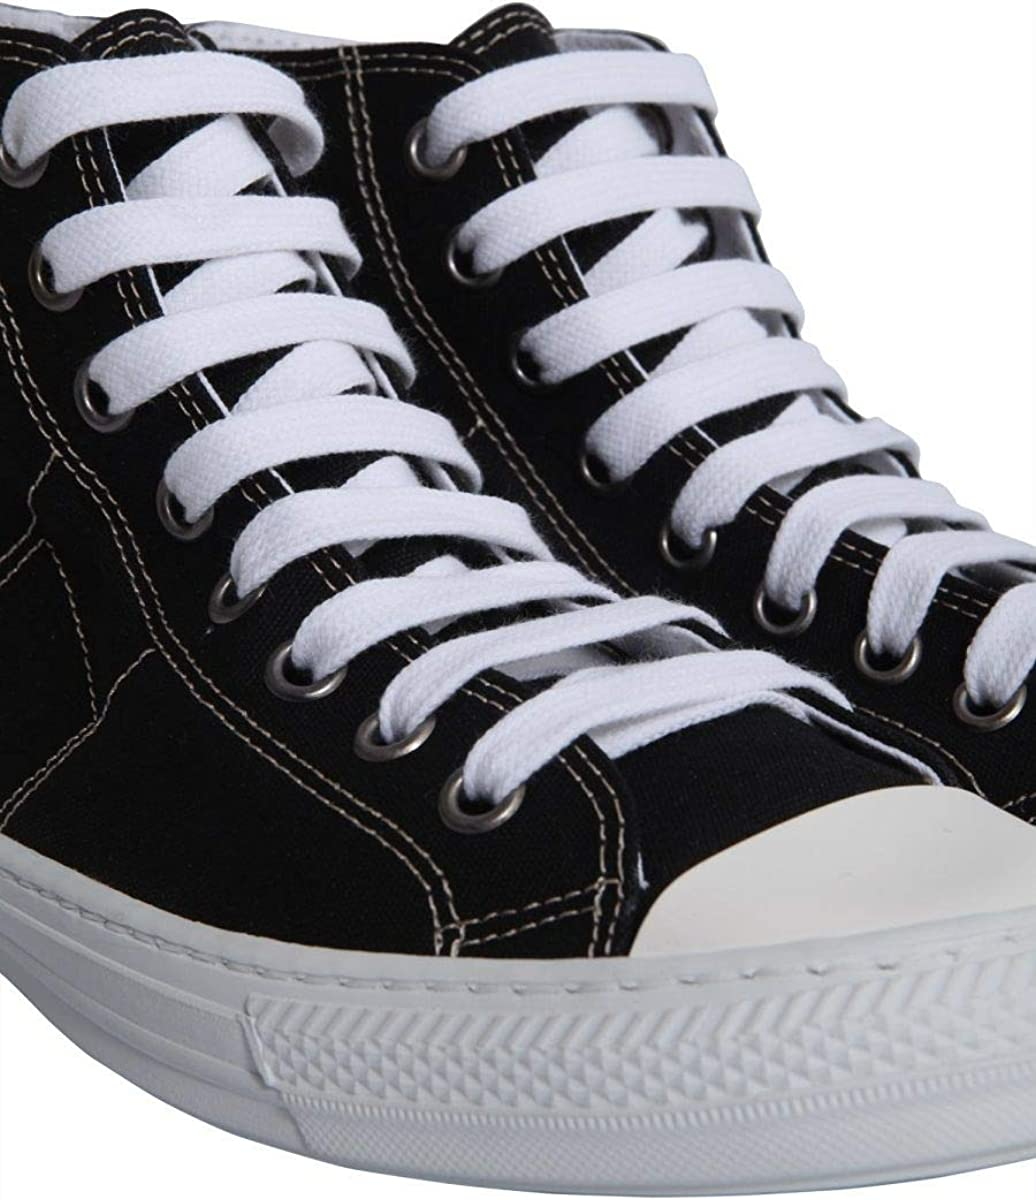 Maison Margiela Luxury Fashion Mens HI TOP Sneakers Summer Black